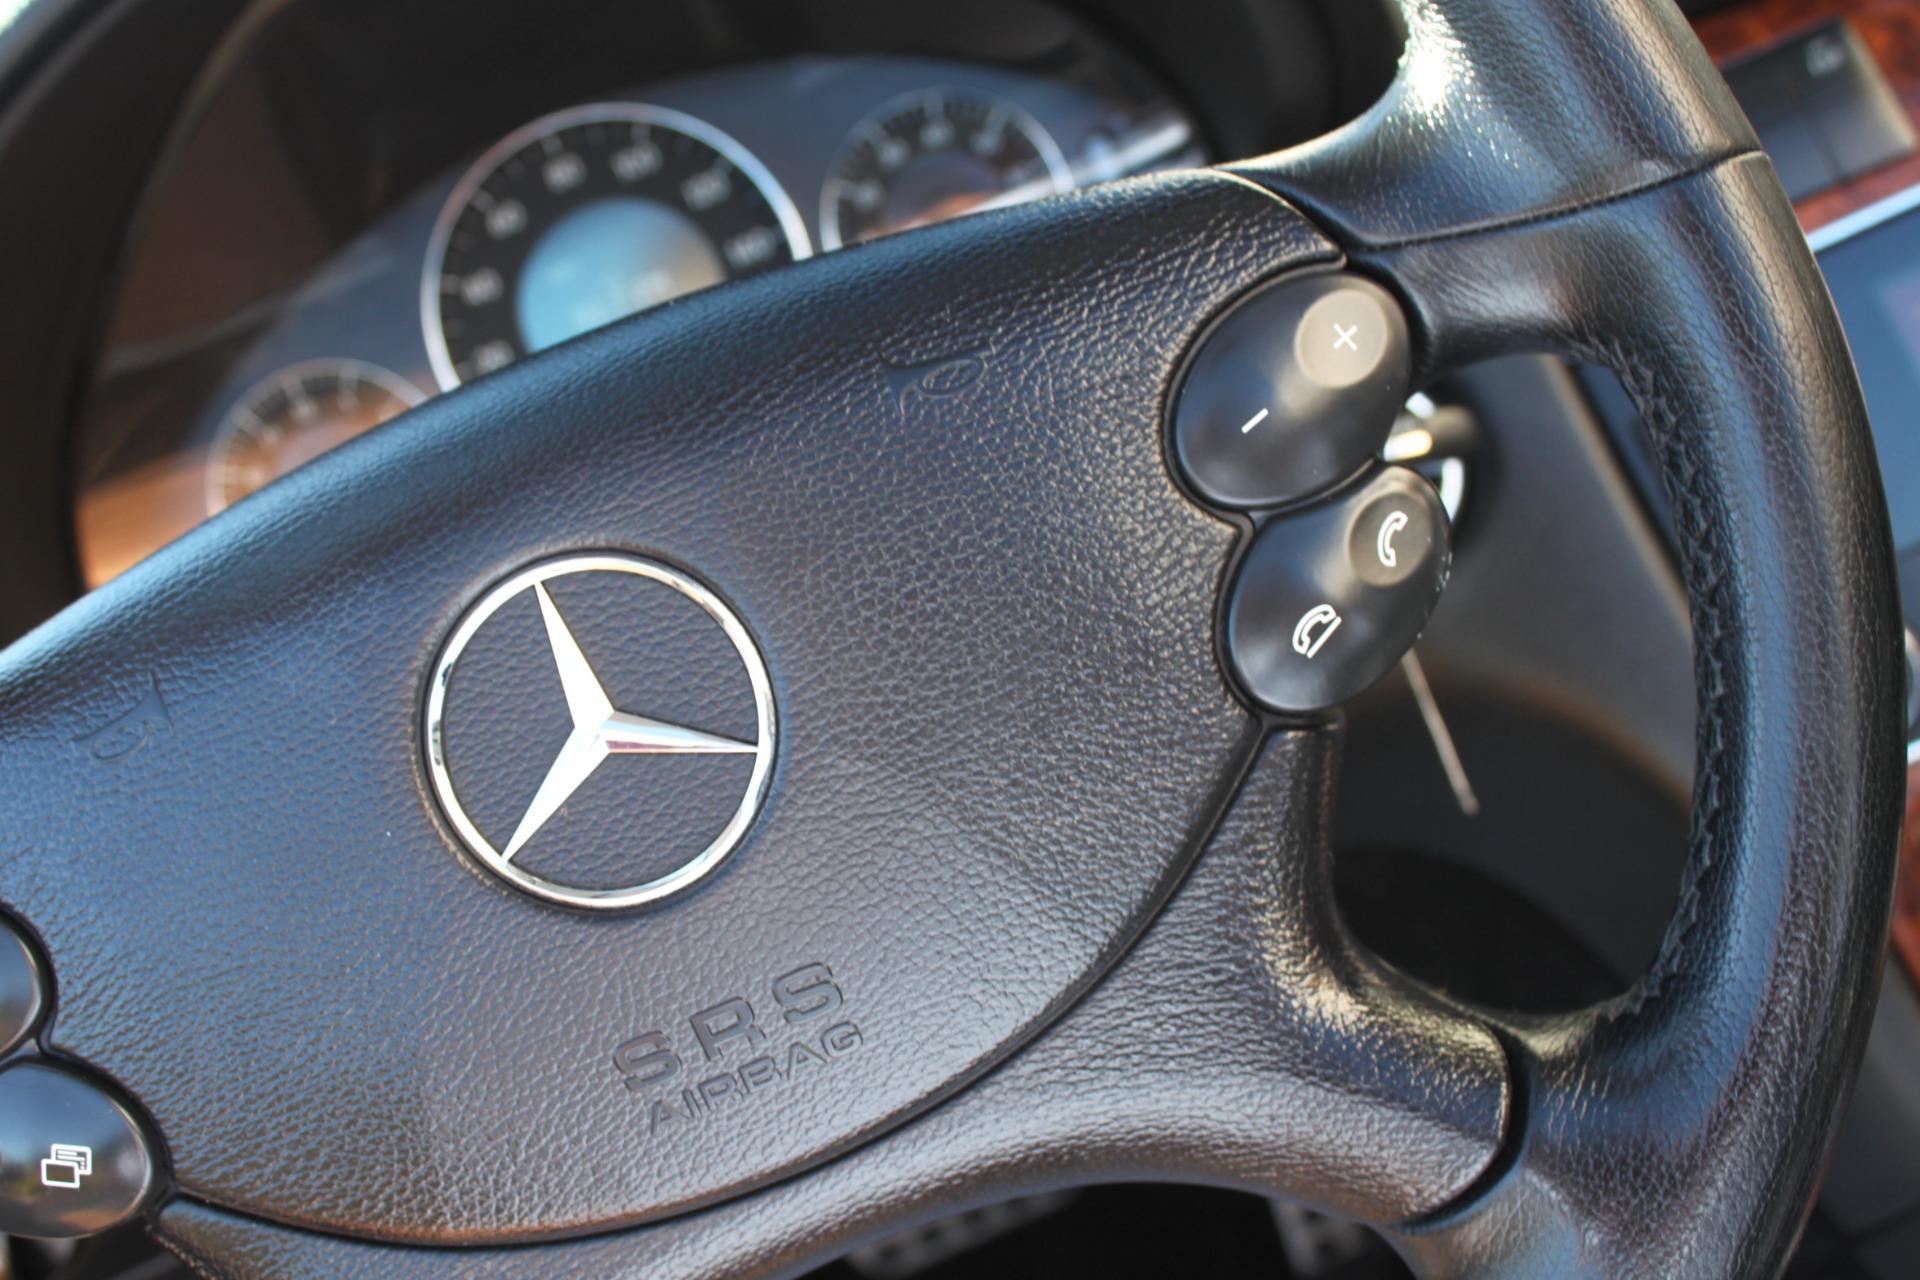 Used-2006-Mercedes-Benz-CLK-Class-Convertible-35L-Range-Rover